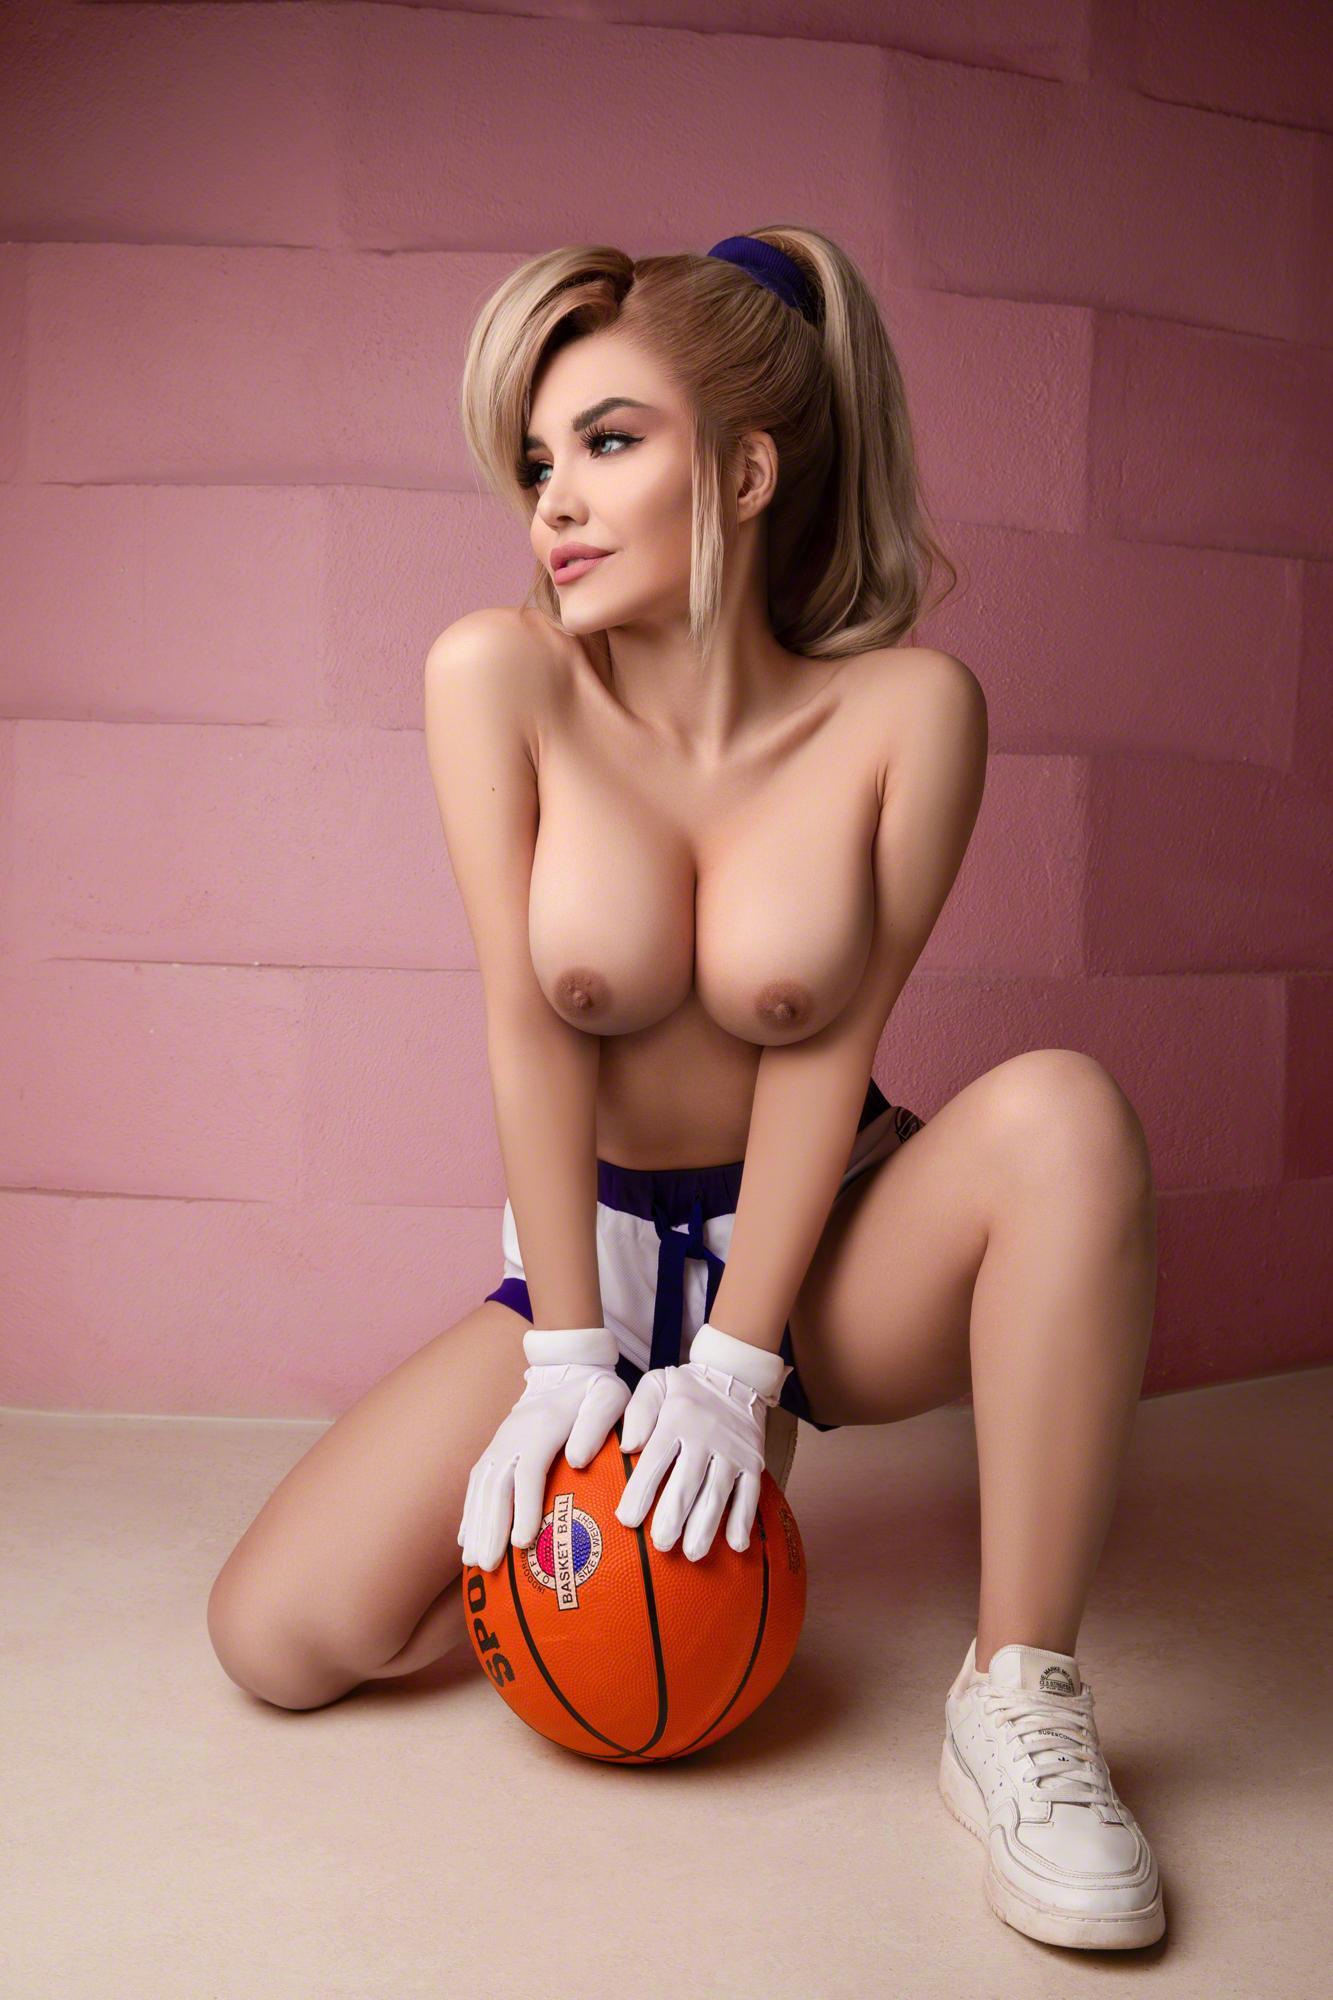 Kalinka Fox Nude Lola Bunny Space Jam Cosplay Leaked Cuvrug